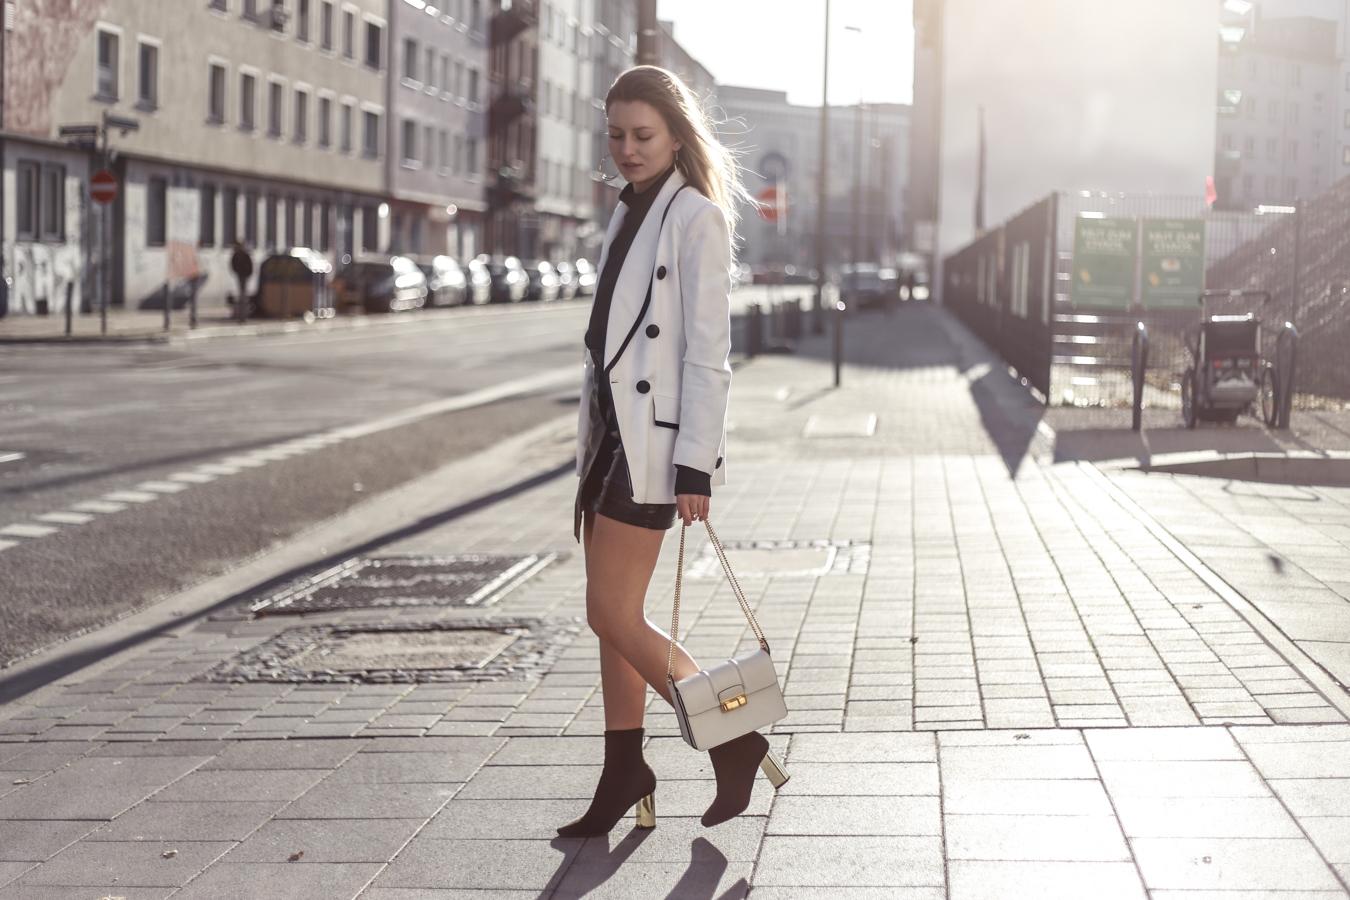 pvc-skirt-vinyl-dior-vintage-livia-auer-7508